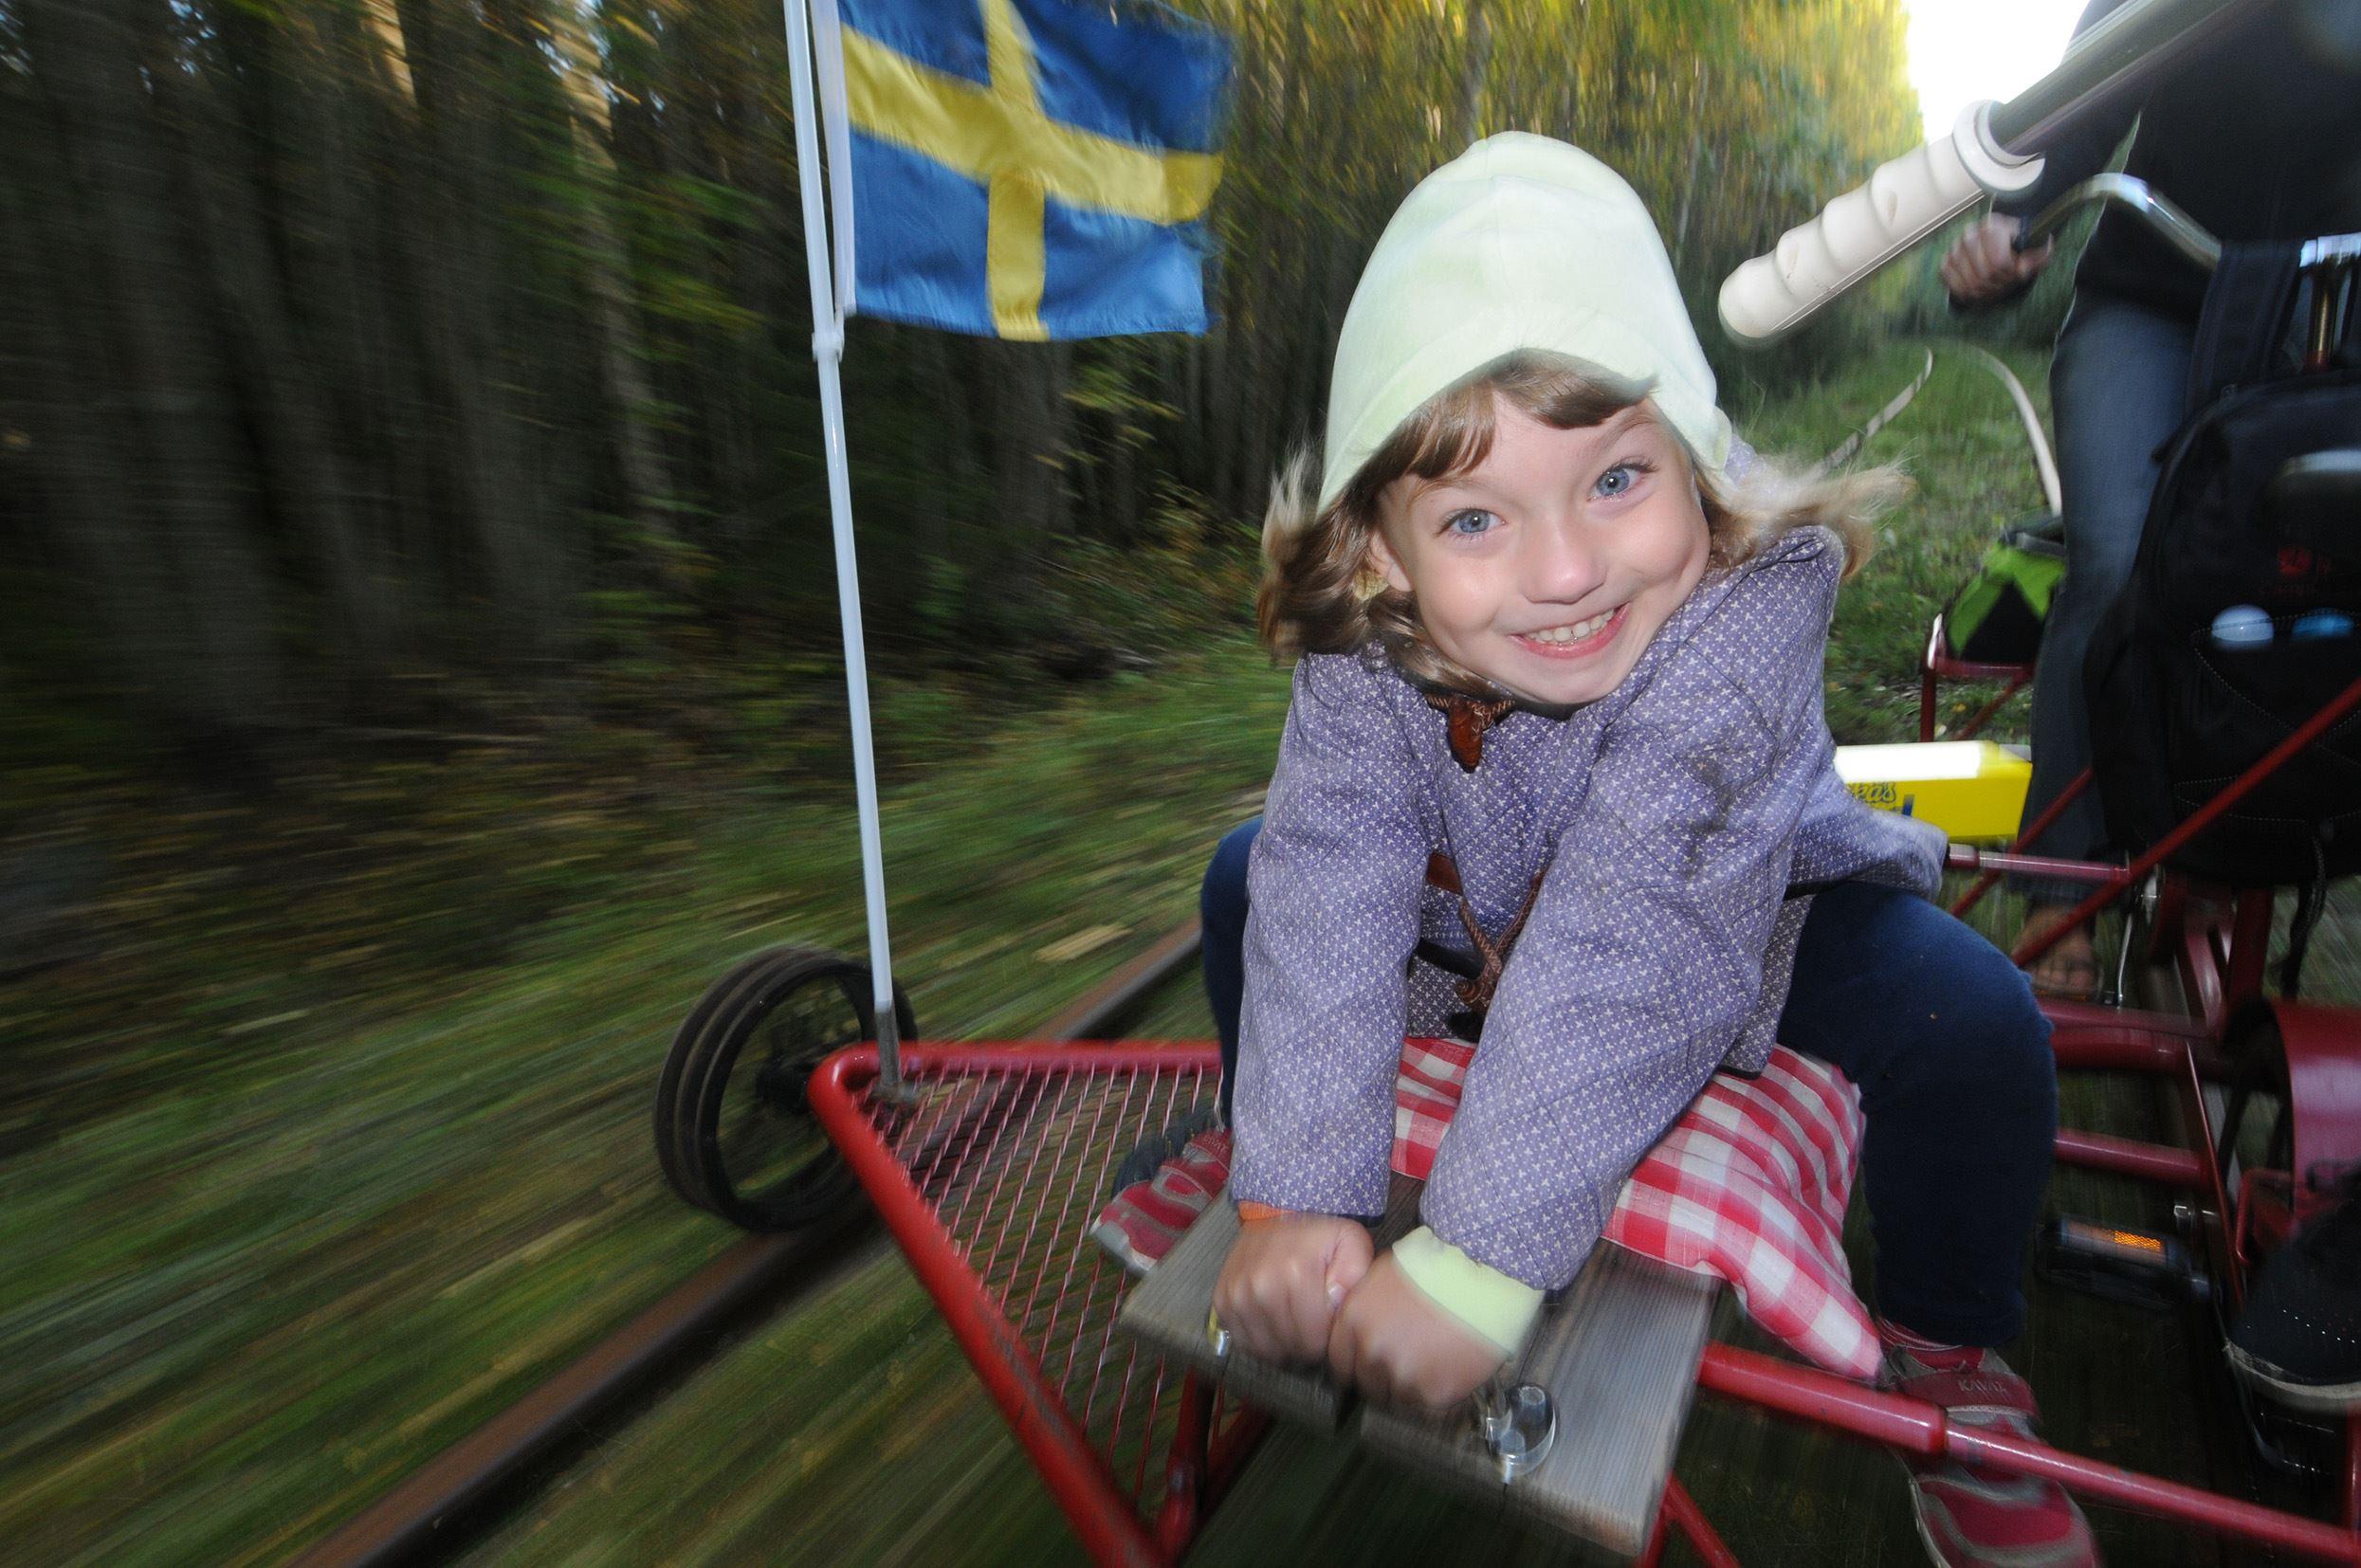 Rail trolley riding on Dellenbanan (the Dellen railroad)